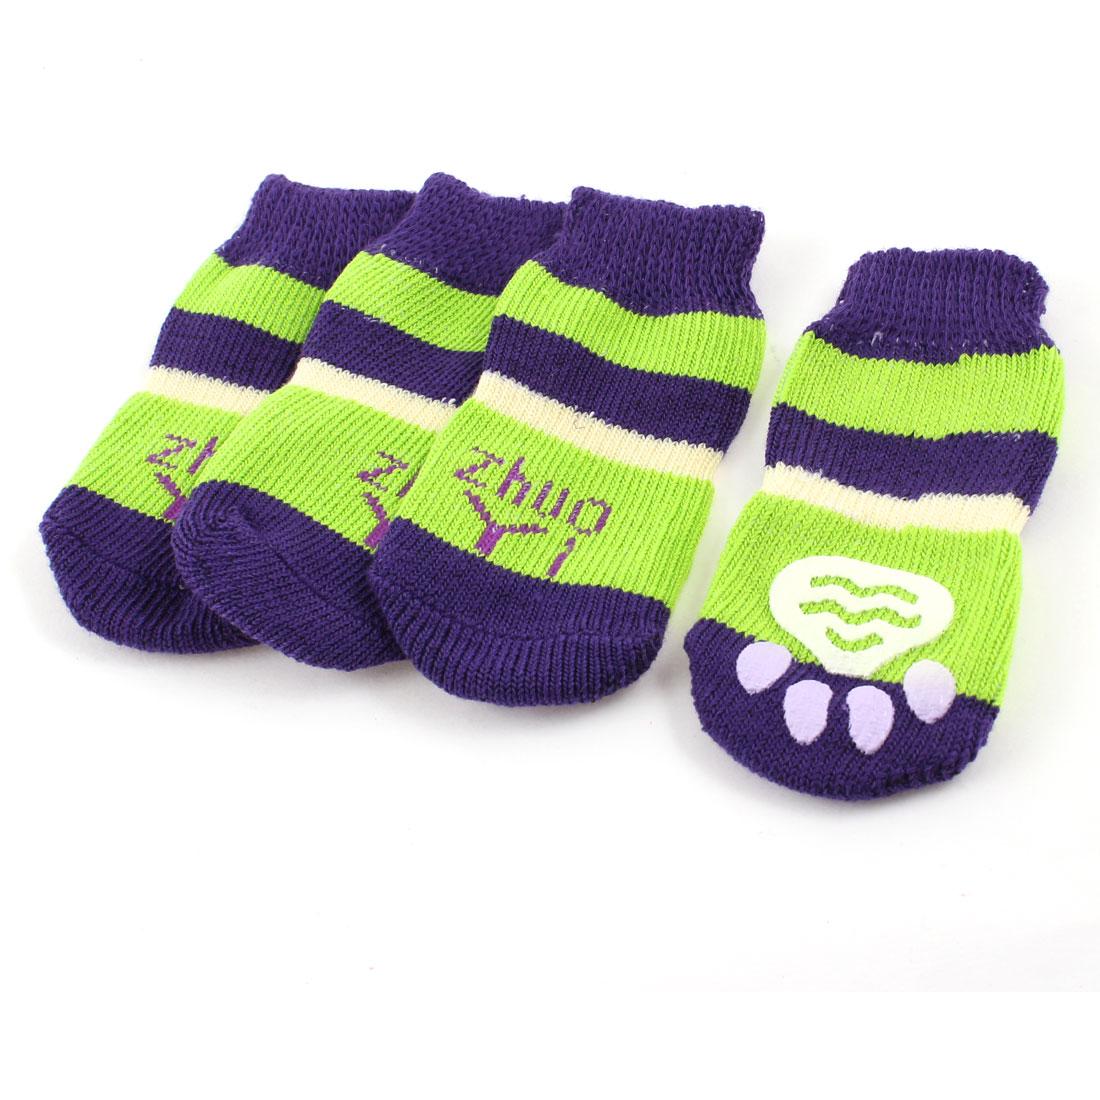 2 Pairs Purple Green Letter Paw Pattern Elastic Cuff Pet Dog Cat Puppy Socks